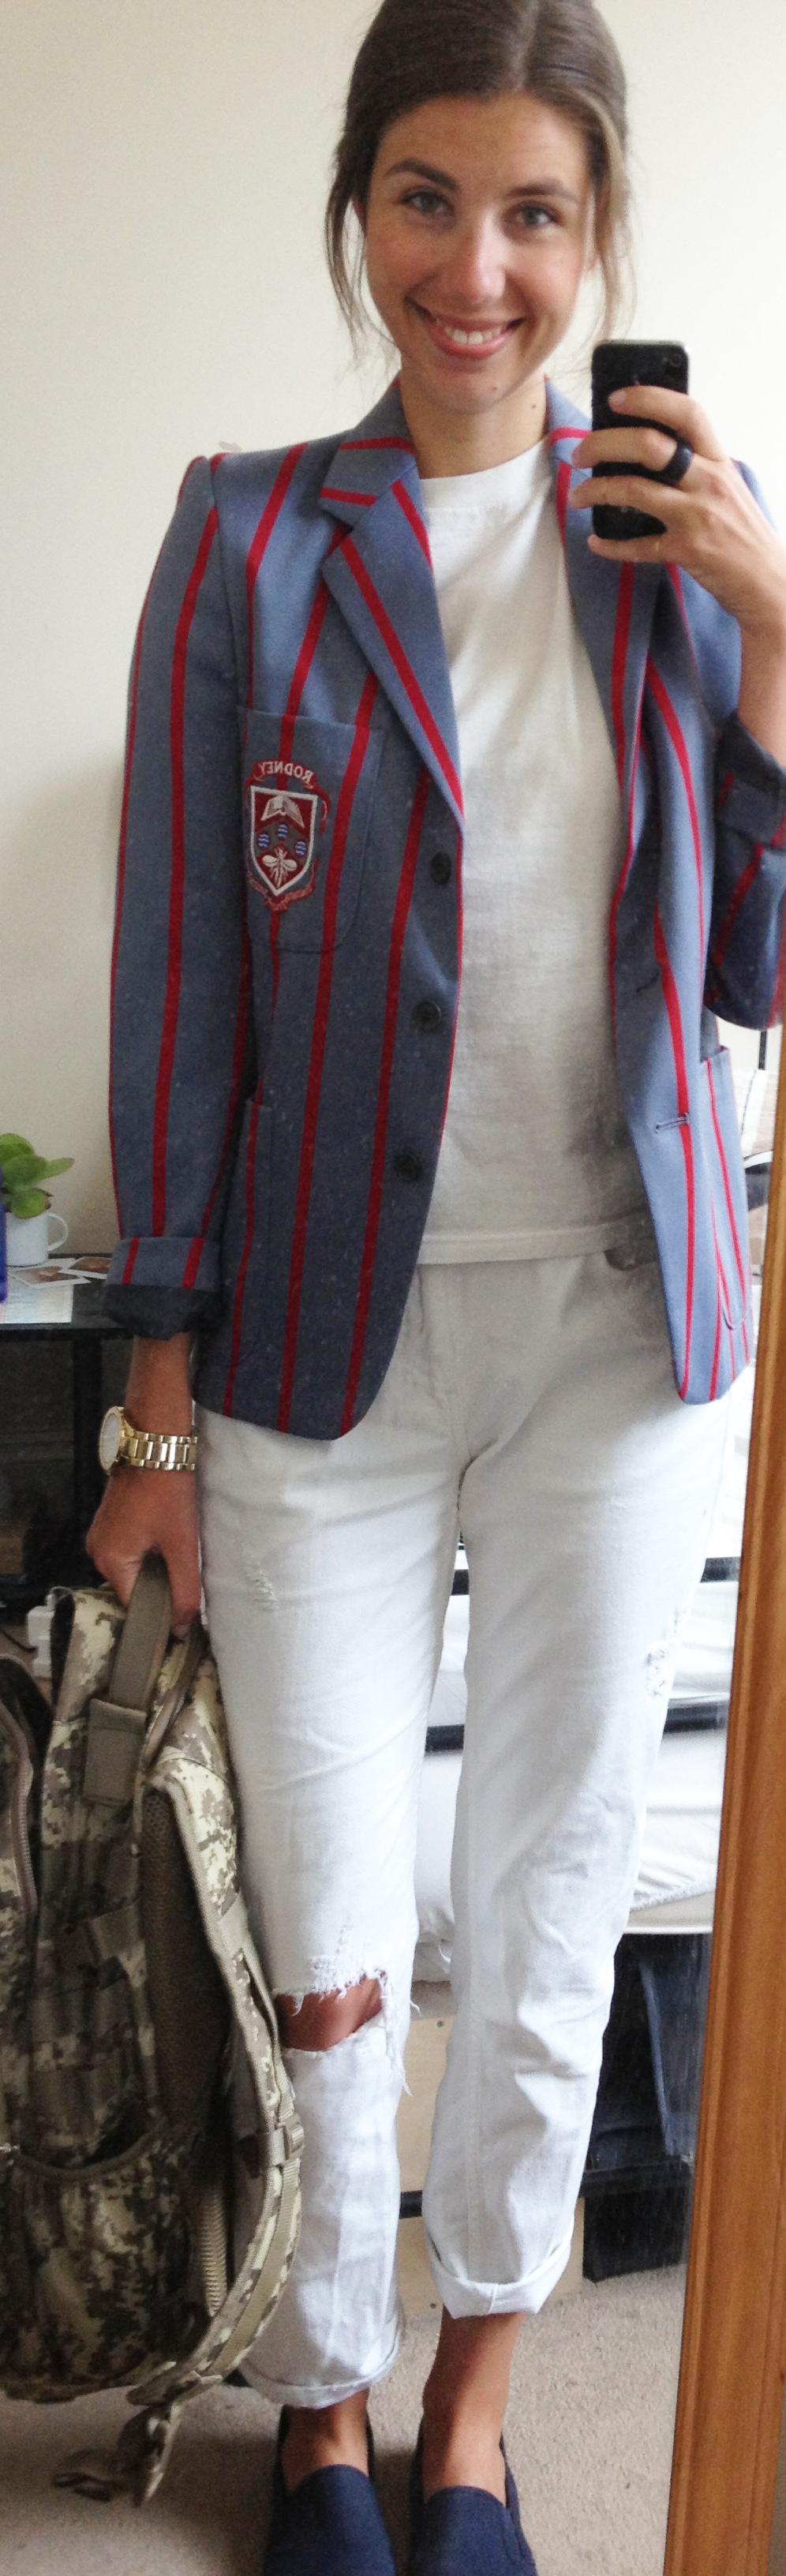 White Boyfriend Jeans , Hanes White T-Shirt ,  Camo Backpack ,  Navy Slip-On Trainers , Vintage Striped Blazer